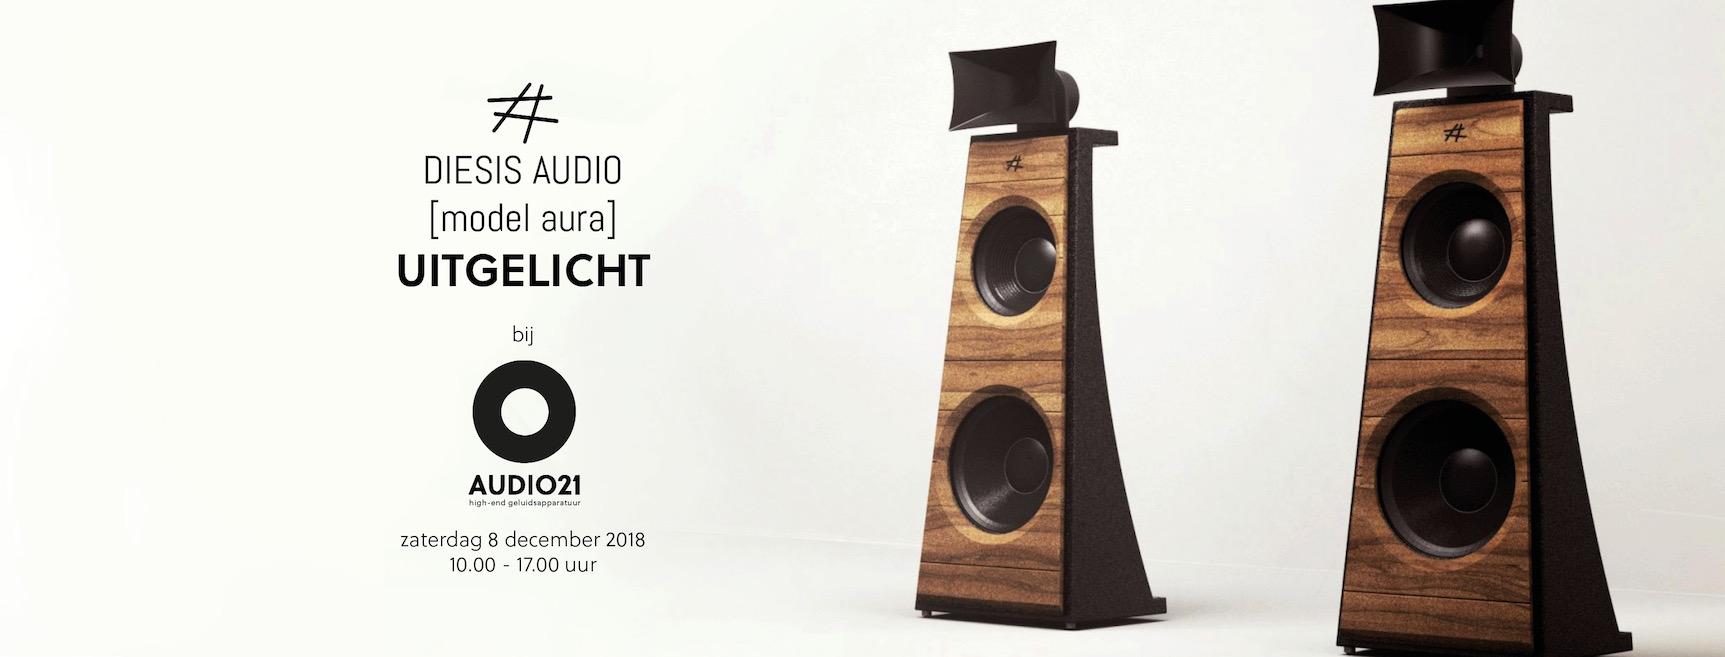 Diesis Audio Luidsprekers Bij Audio21 Demo Op 8 December